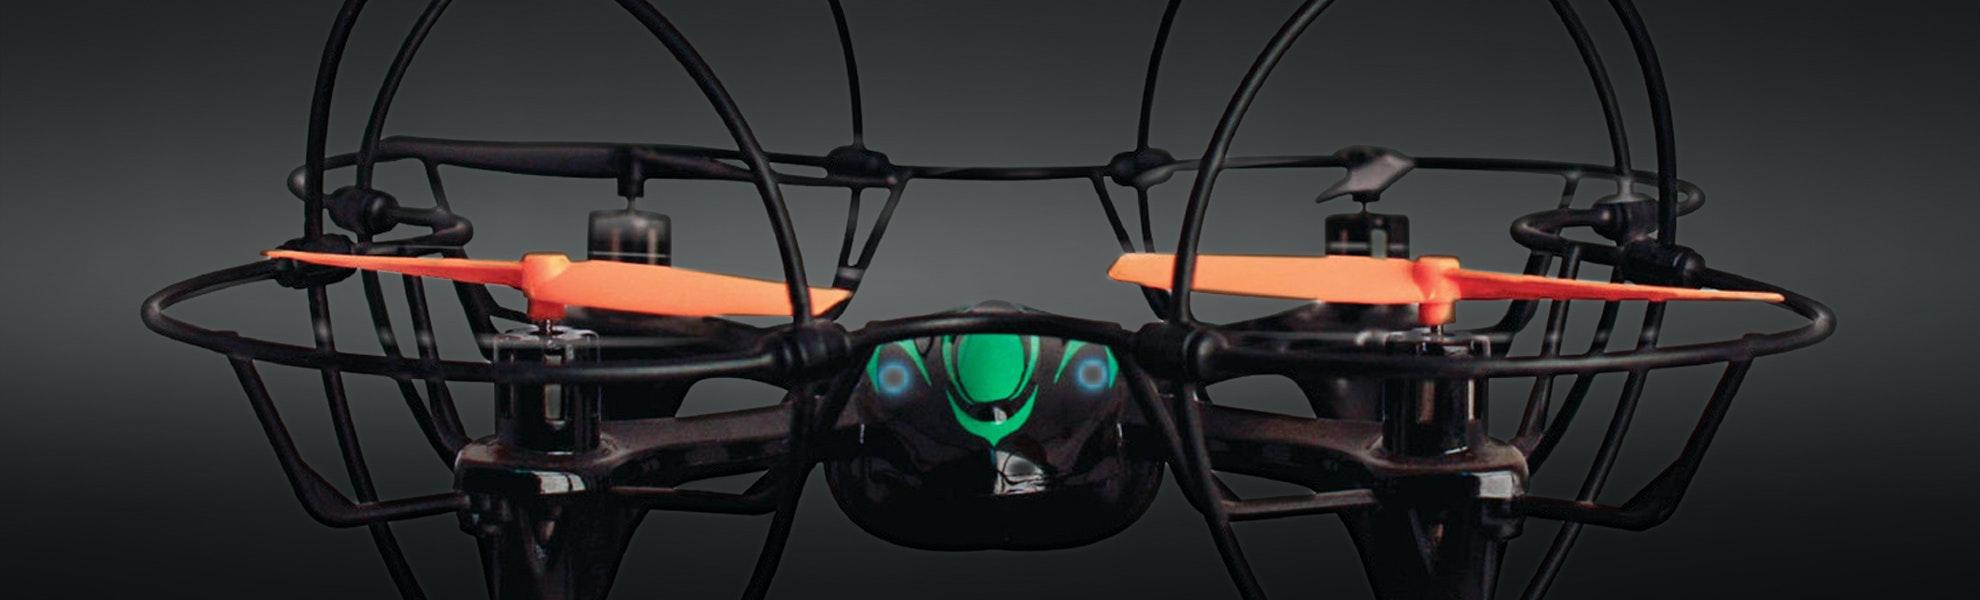 Urge Basics 6 Axis Quadcopter RTF